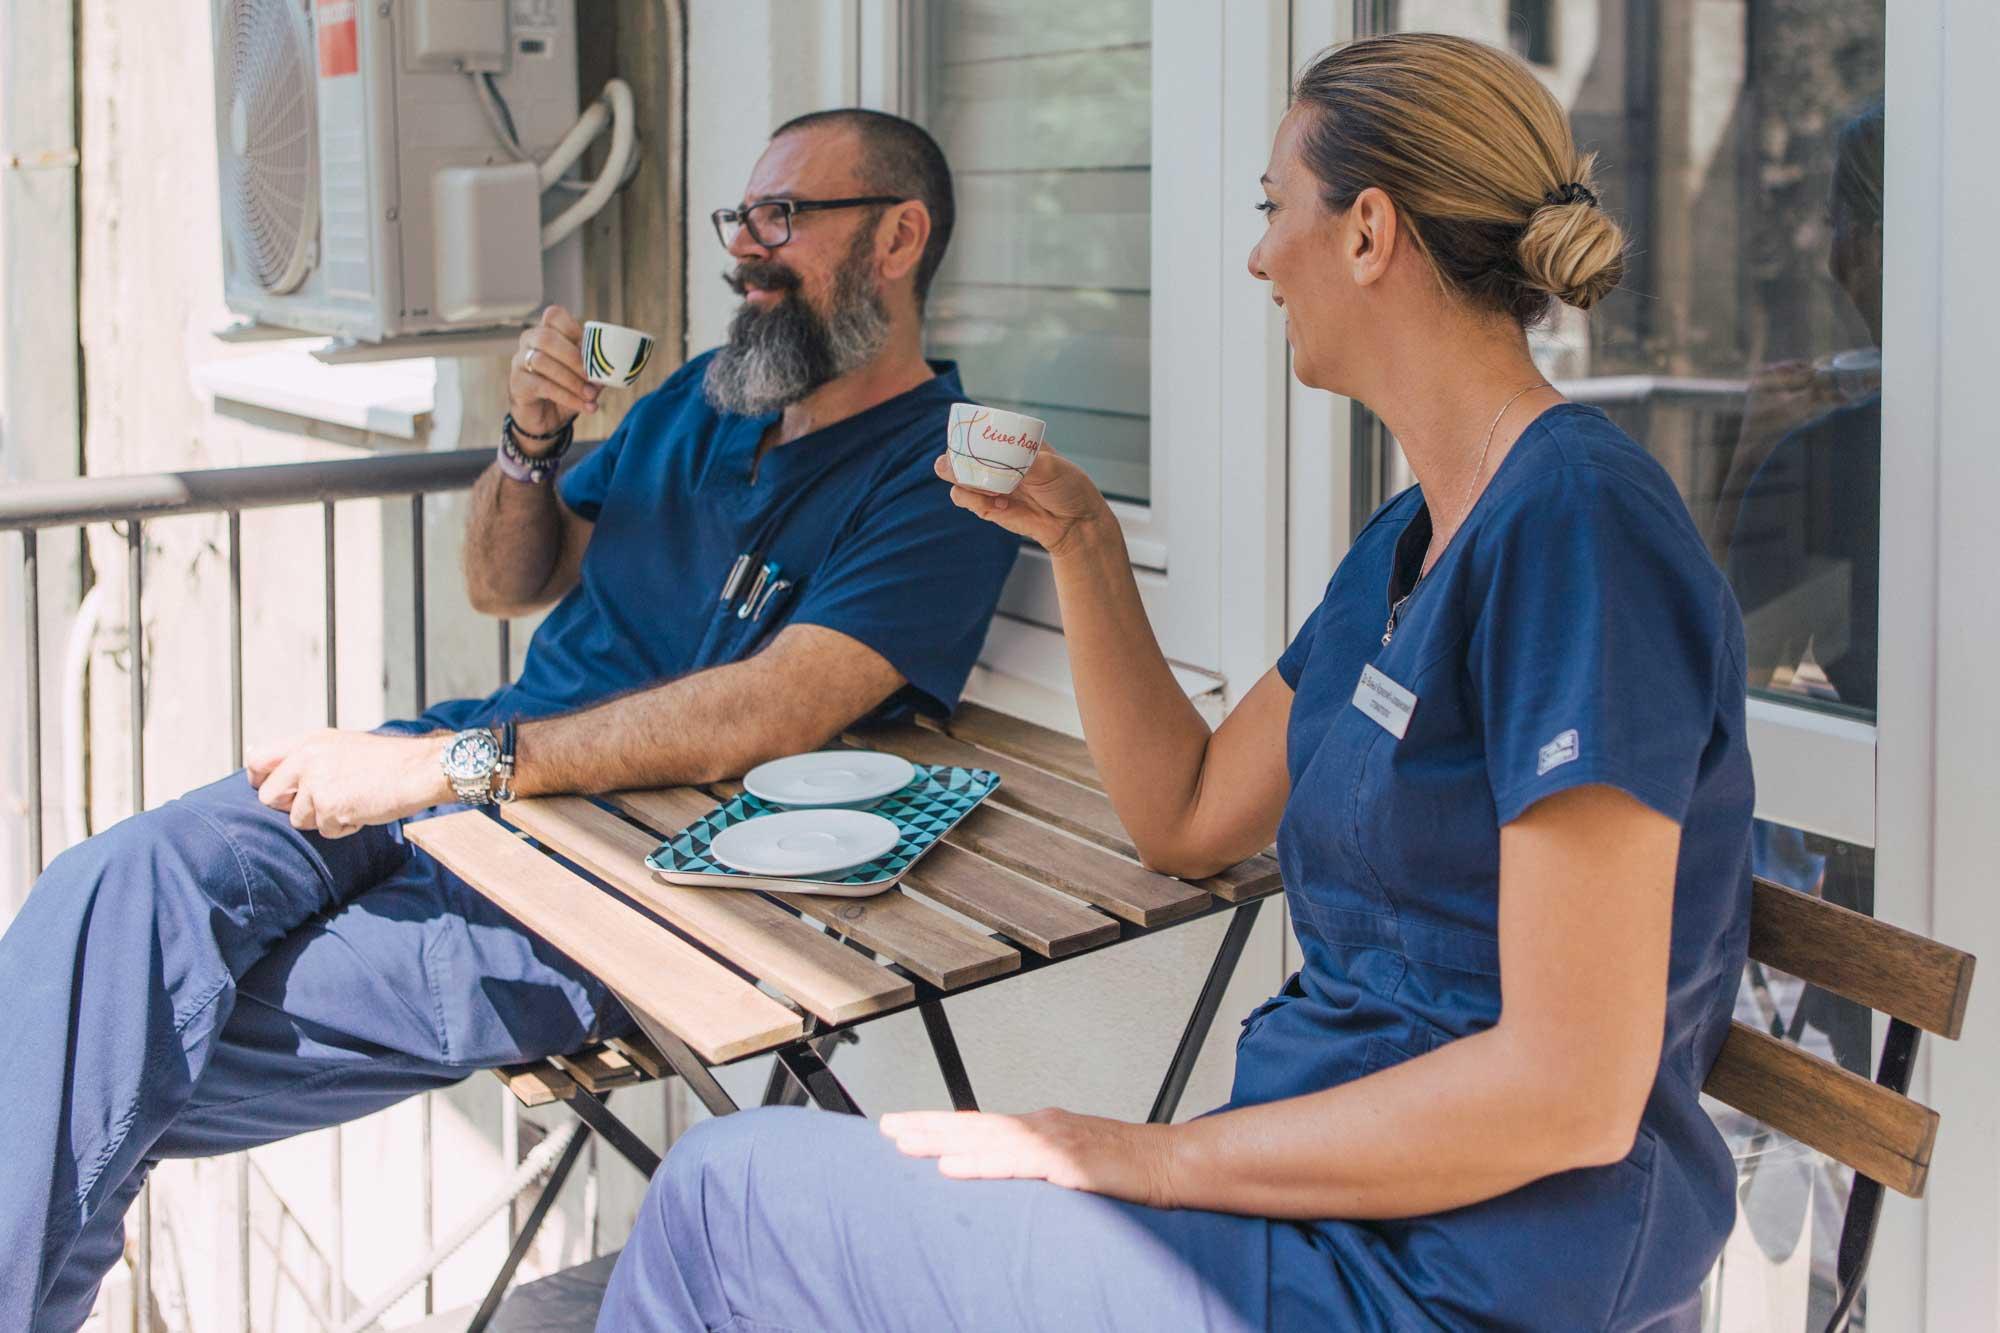 stomatoloska-ordinacija-vunjak-dental-clinic-pauza-uz-kafu